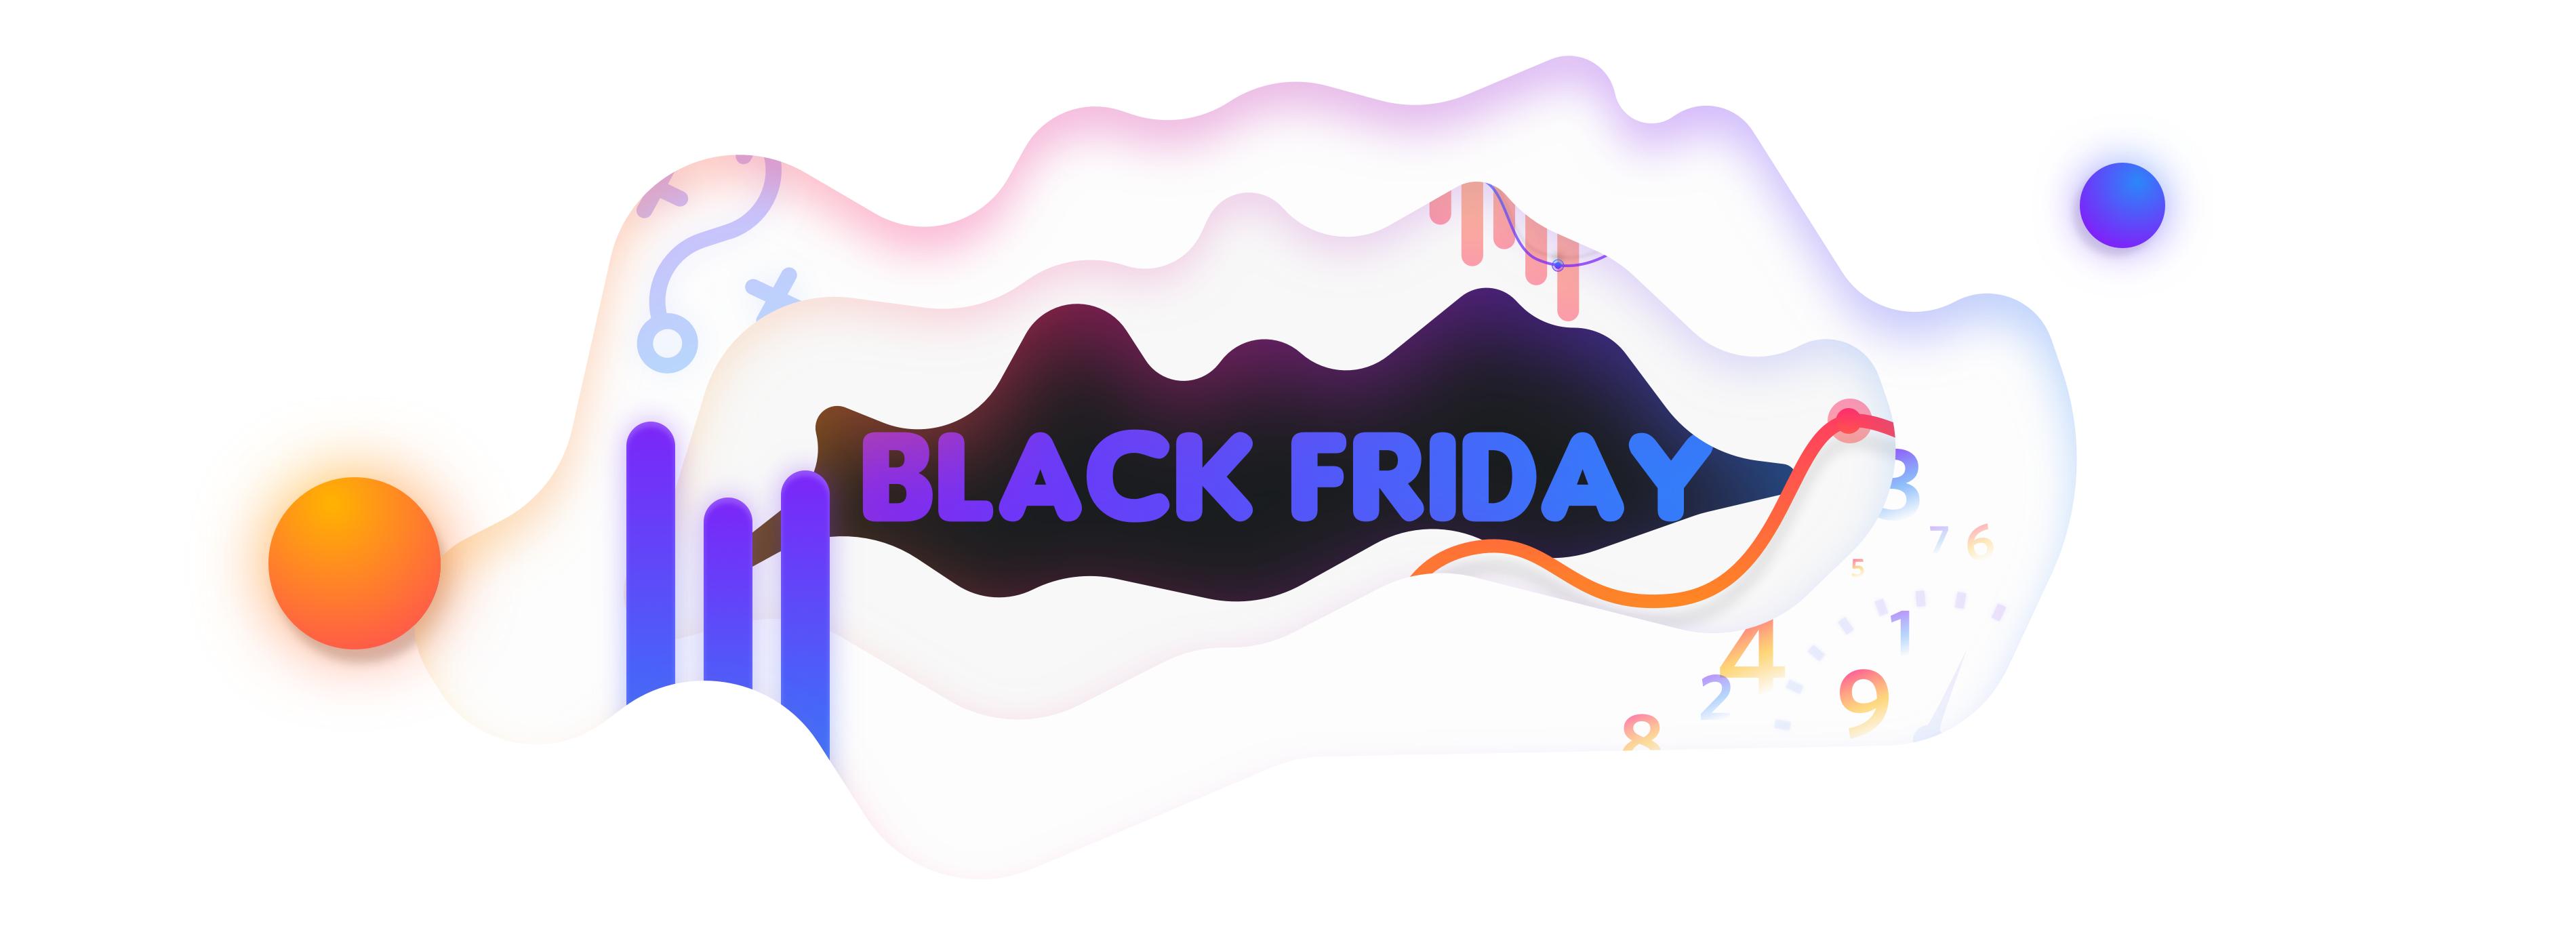 Black Friday 2021 Ultimate Ecommerce Strategy